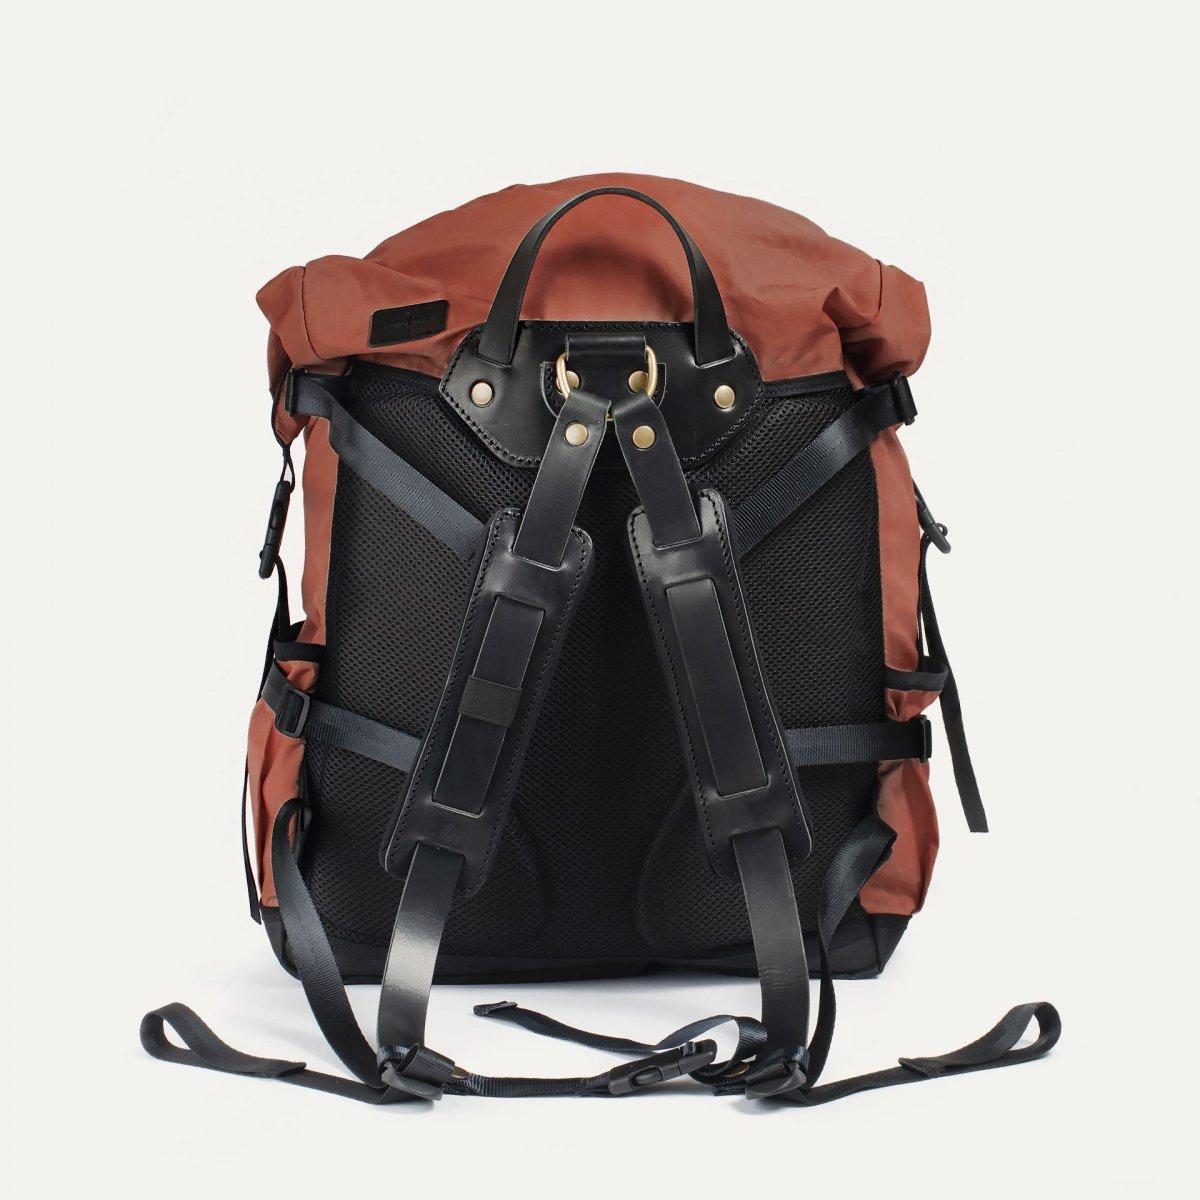 20L Basile Backpack - Burgundy (image n°3)